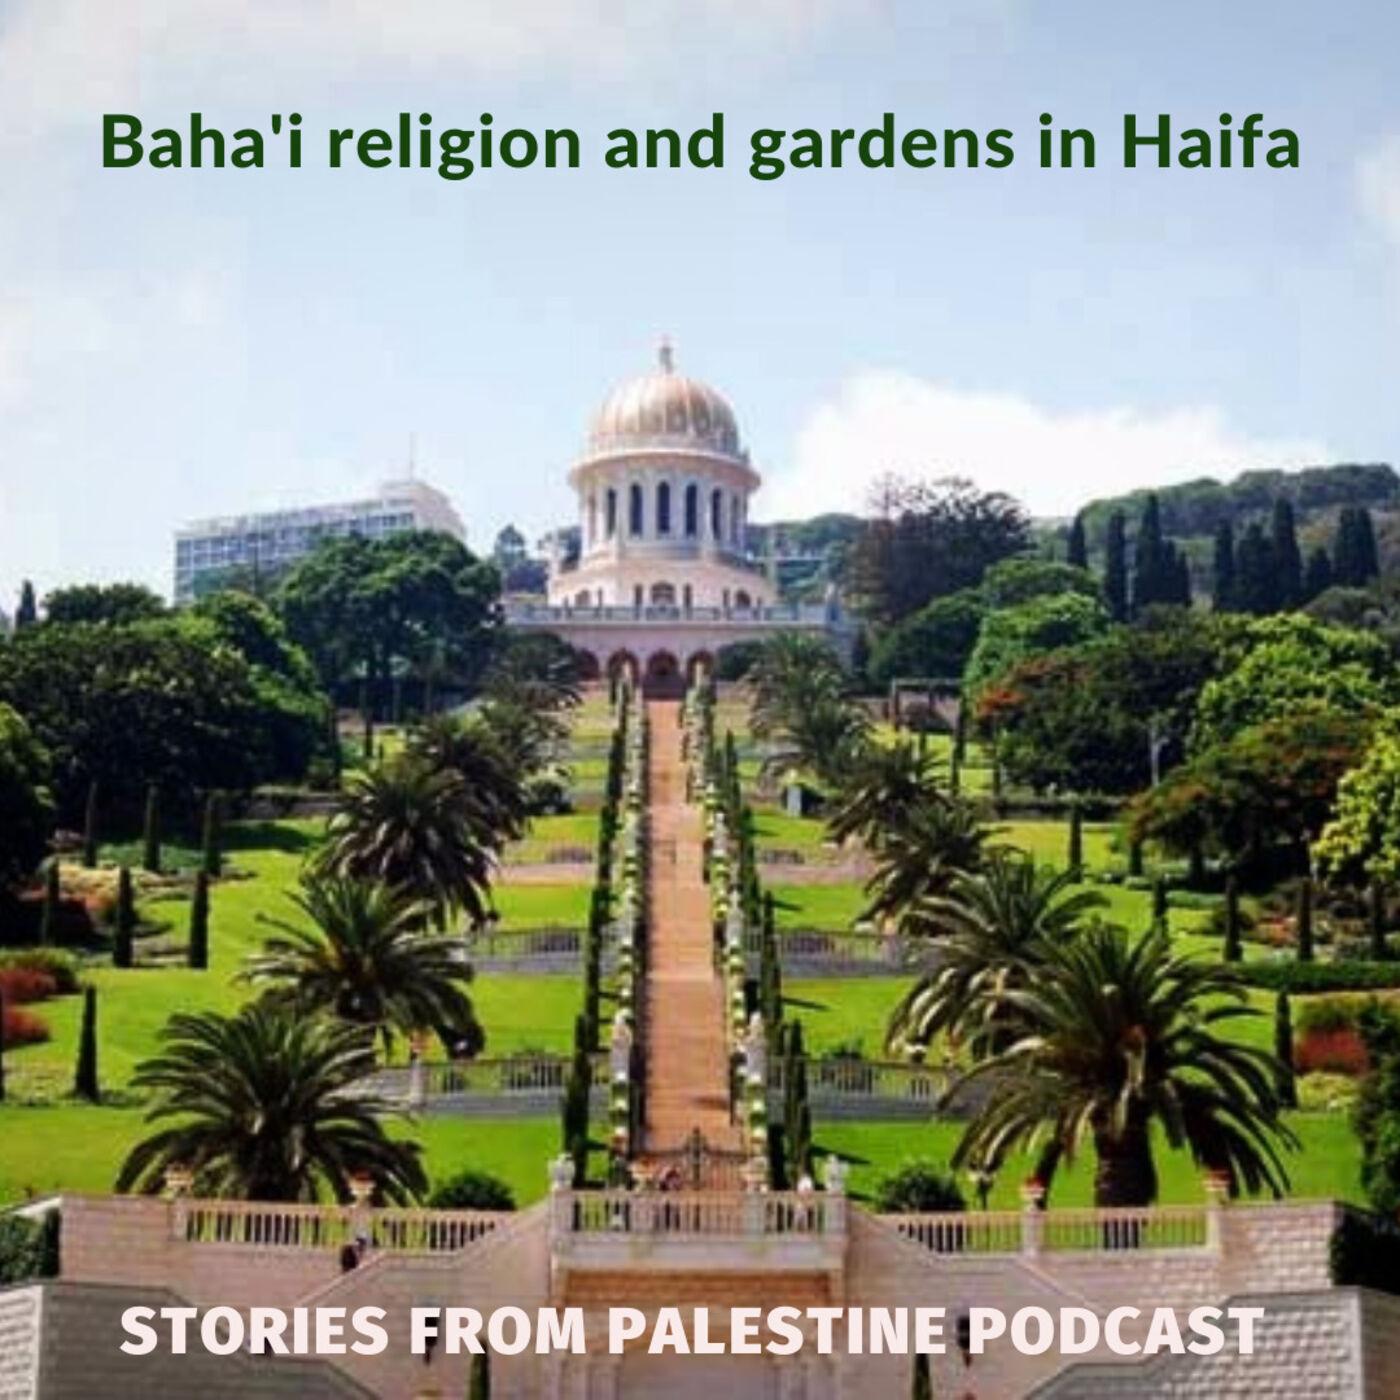 Summer shorts #5 The Bahai religion and Bahai gardens in Haifa